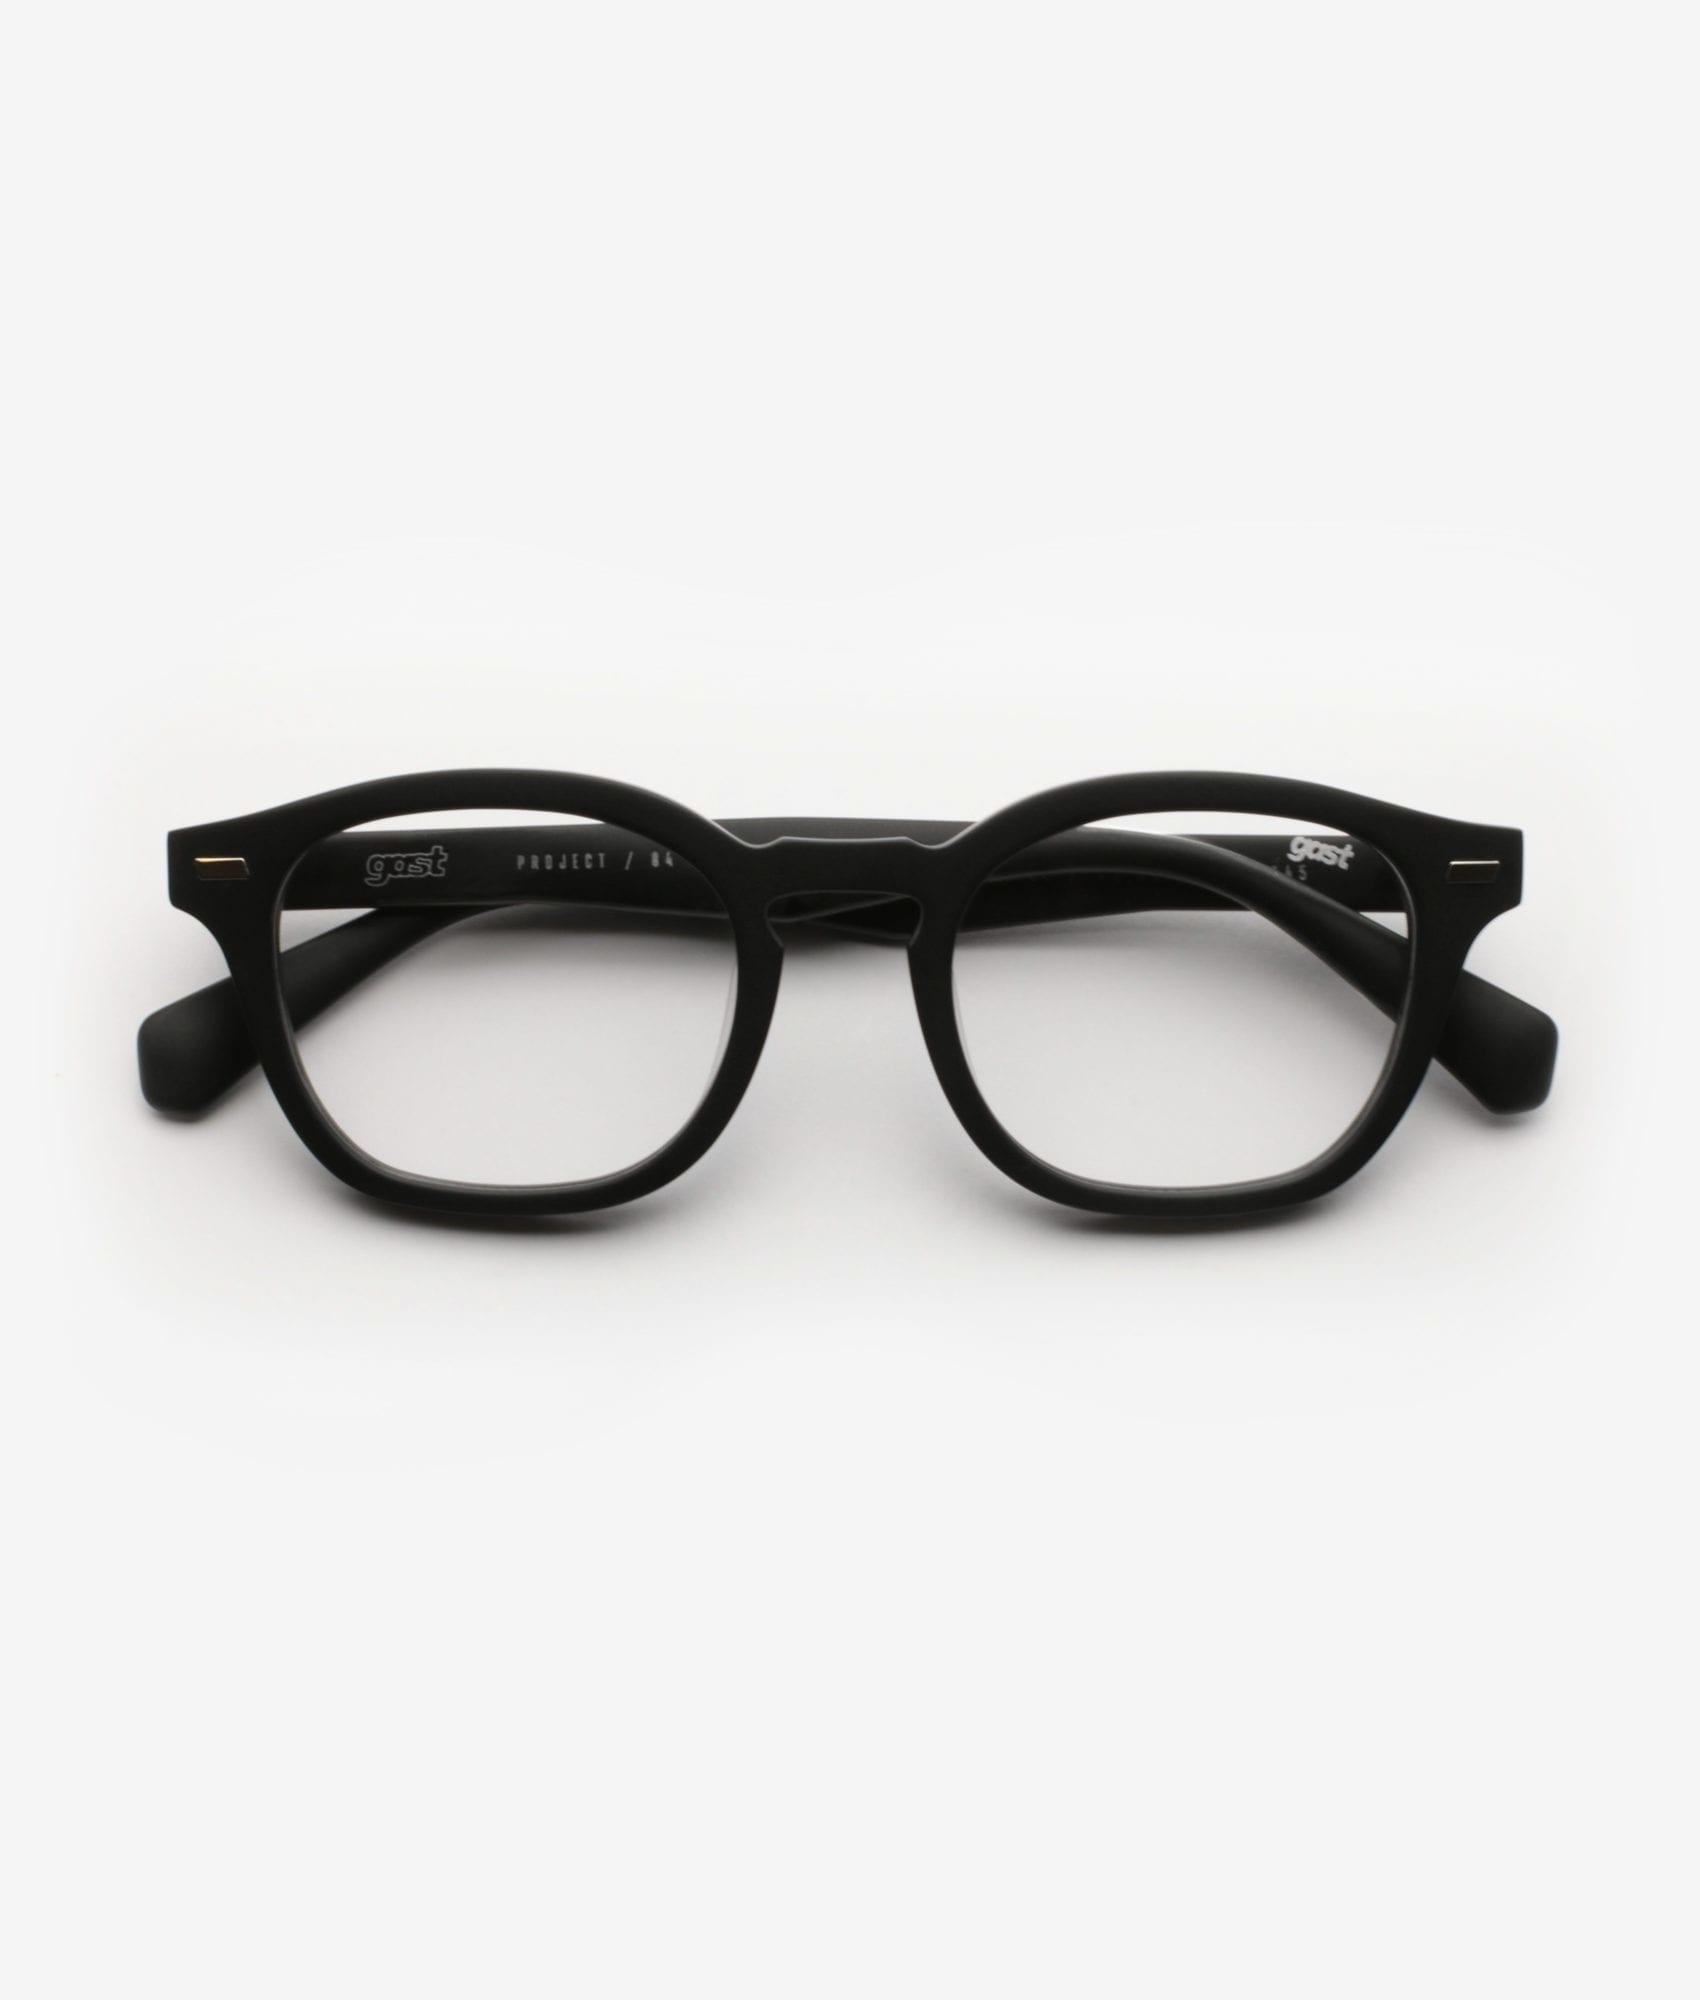 Lus Black Gast eyewear